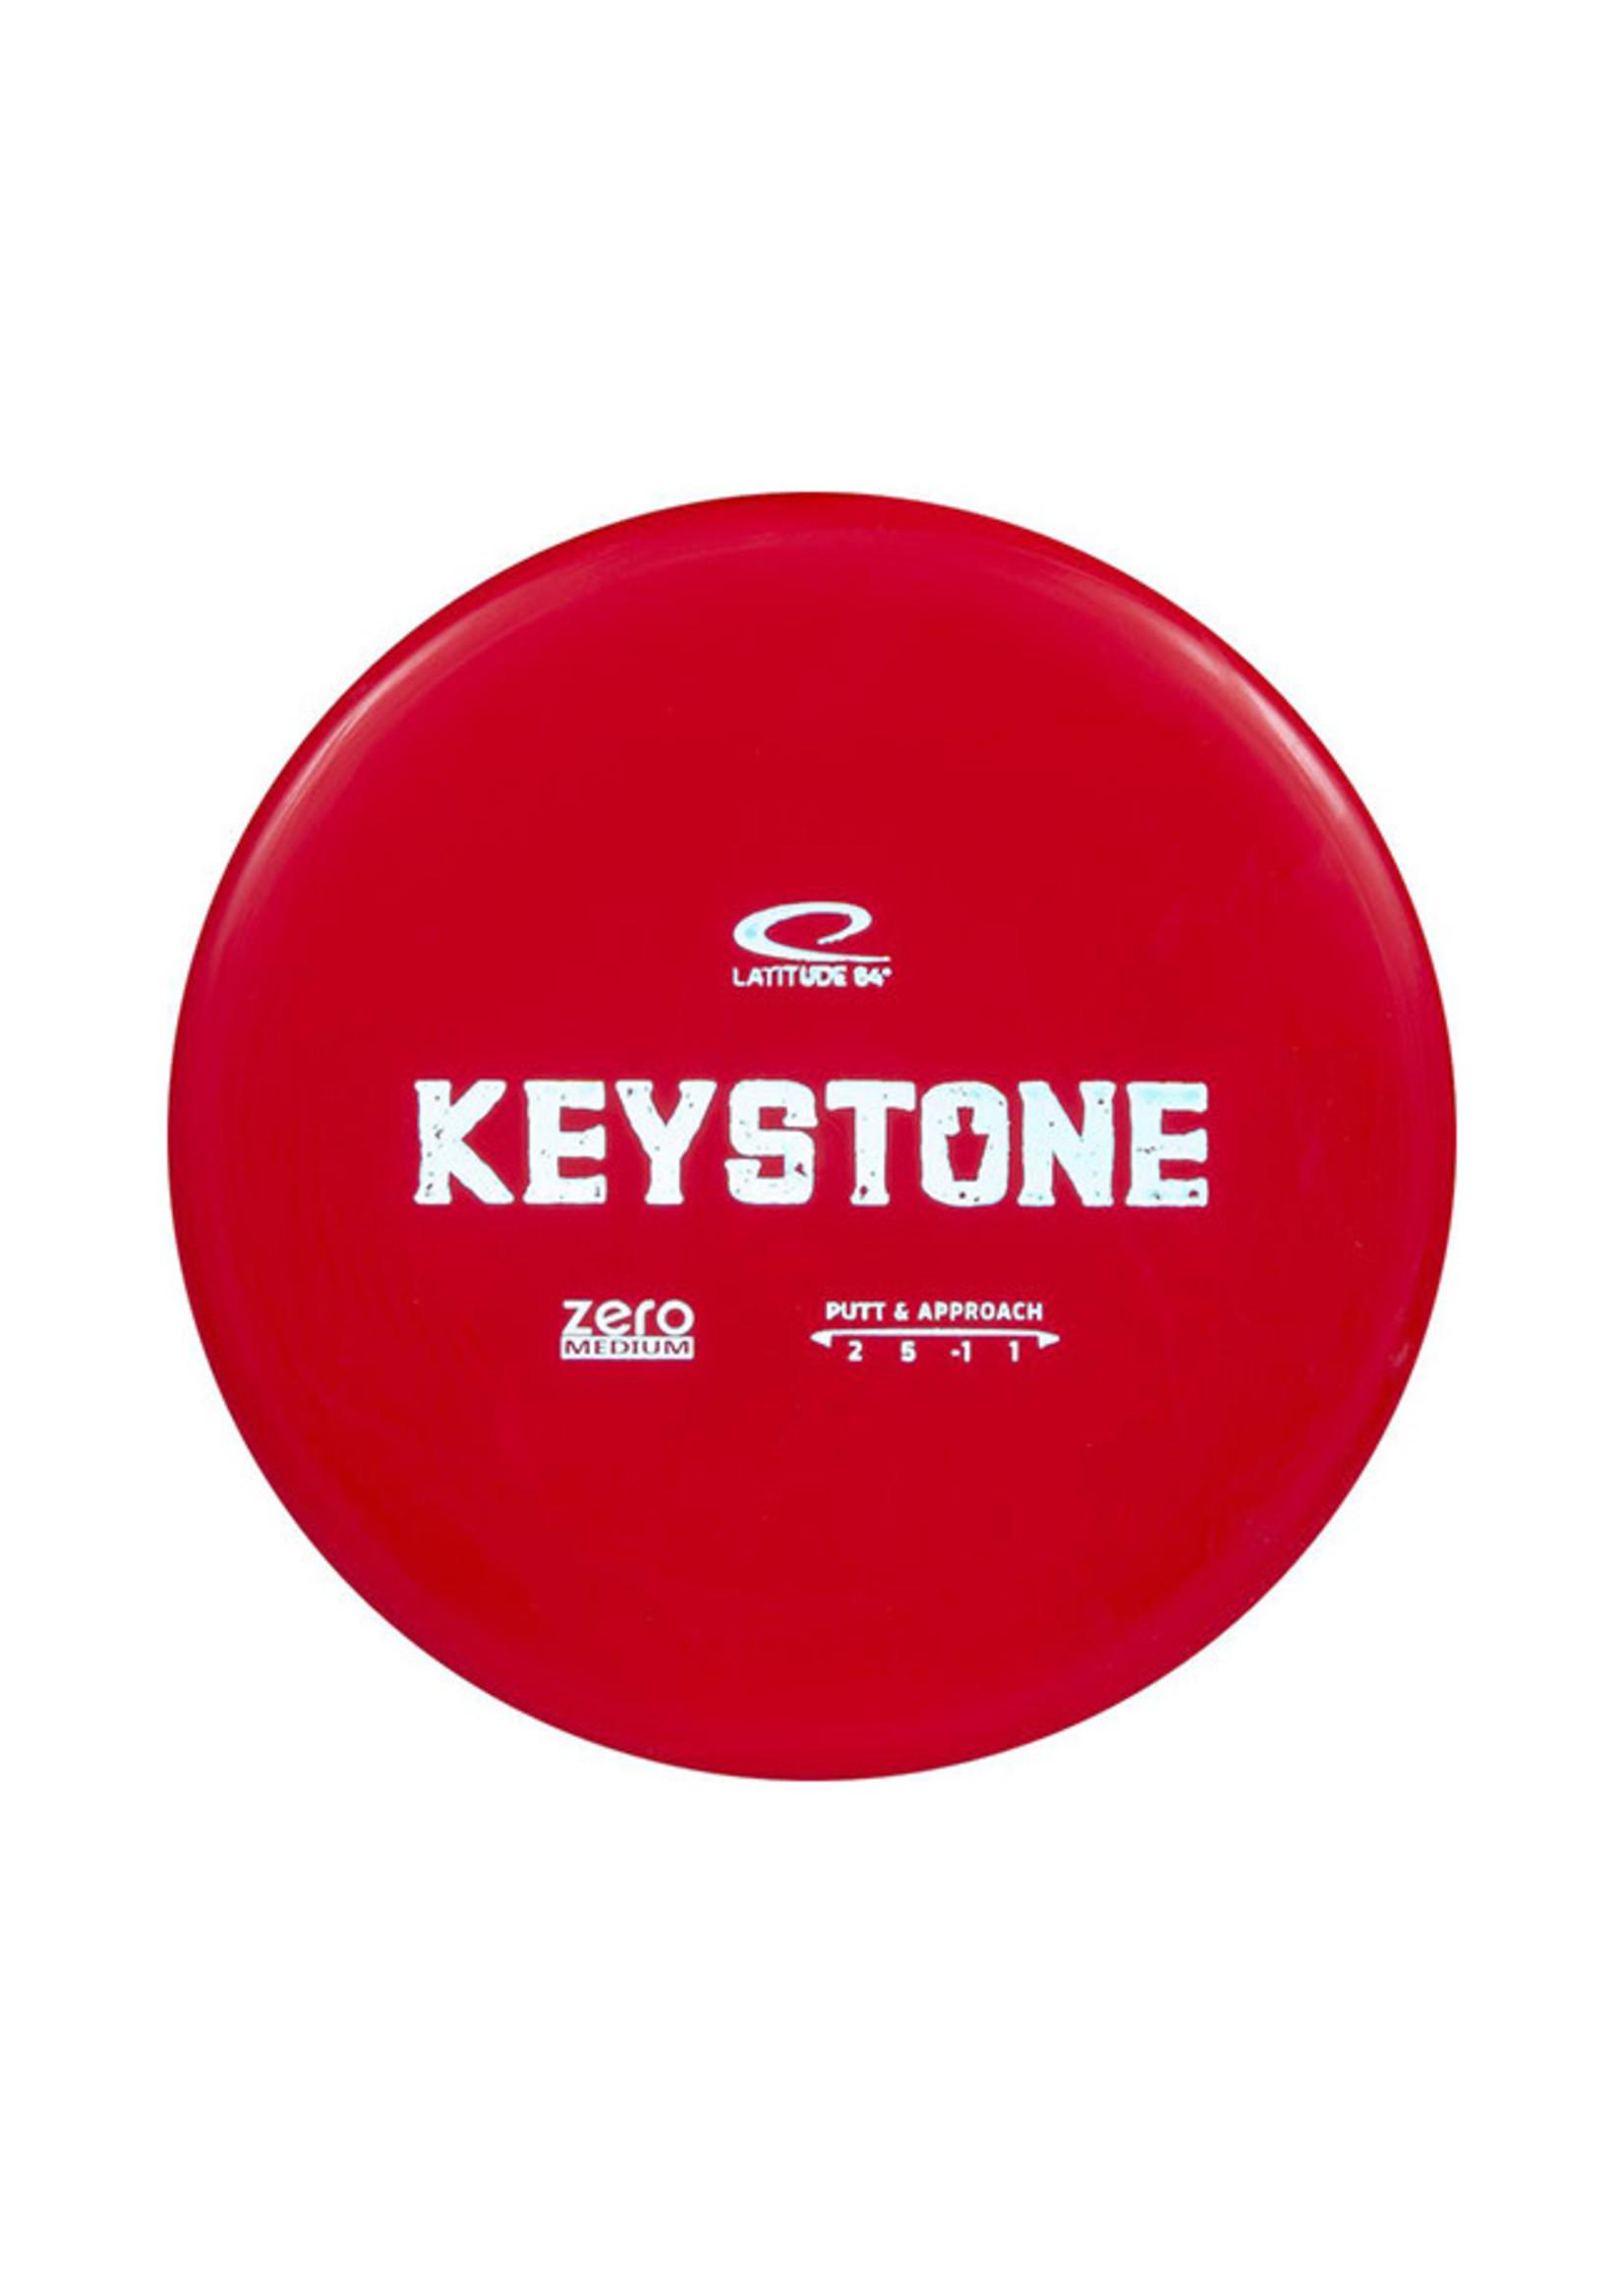 Latitude 64 Latitude 64 Keystone Putt & Approach Disc